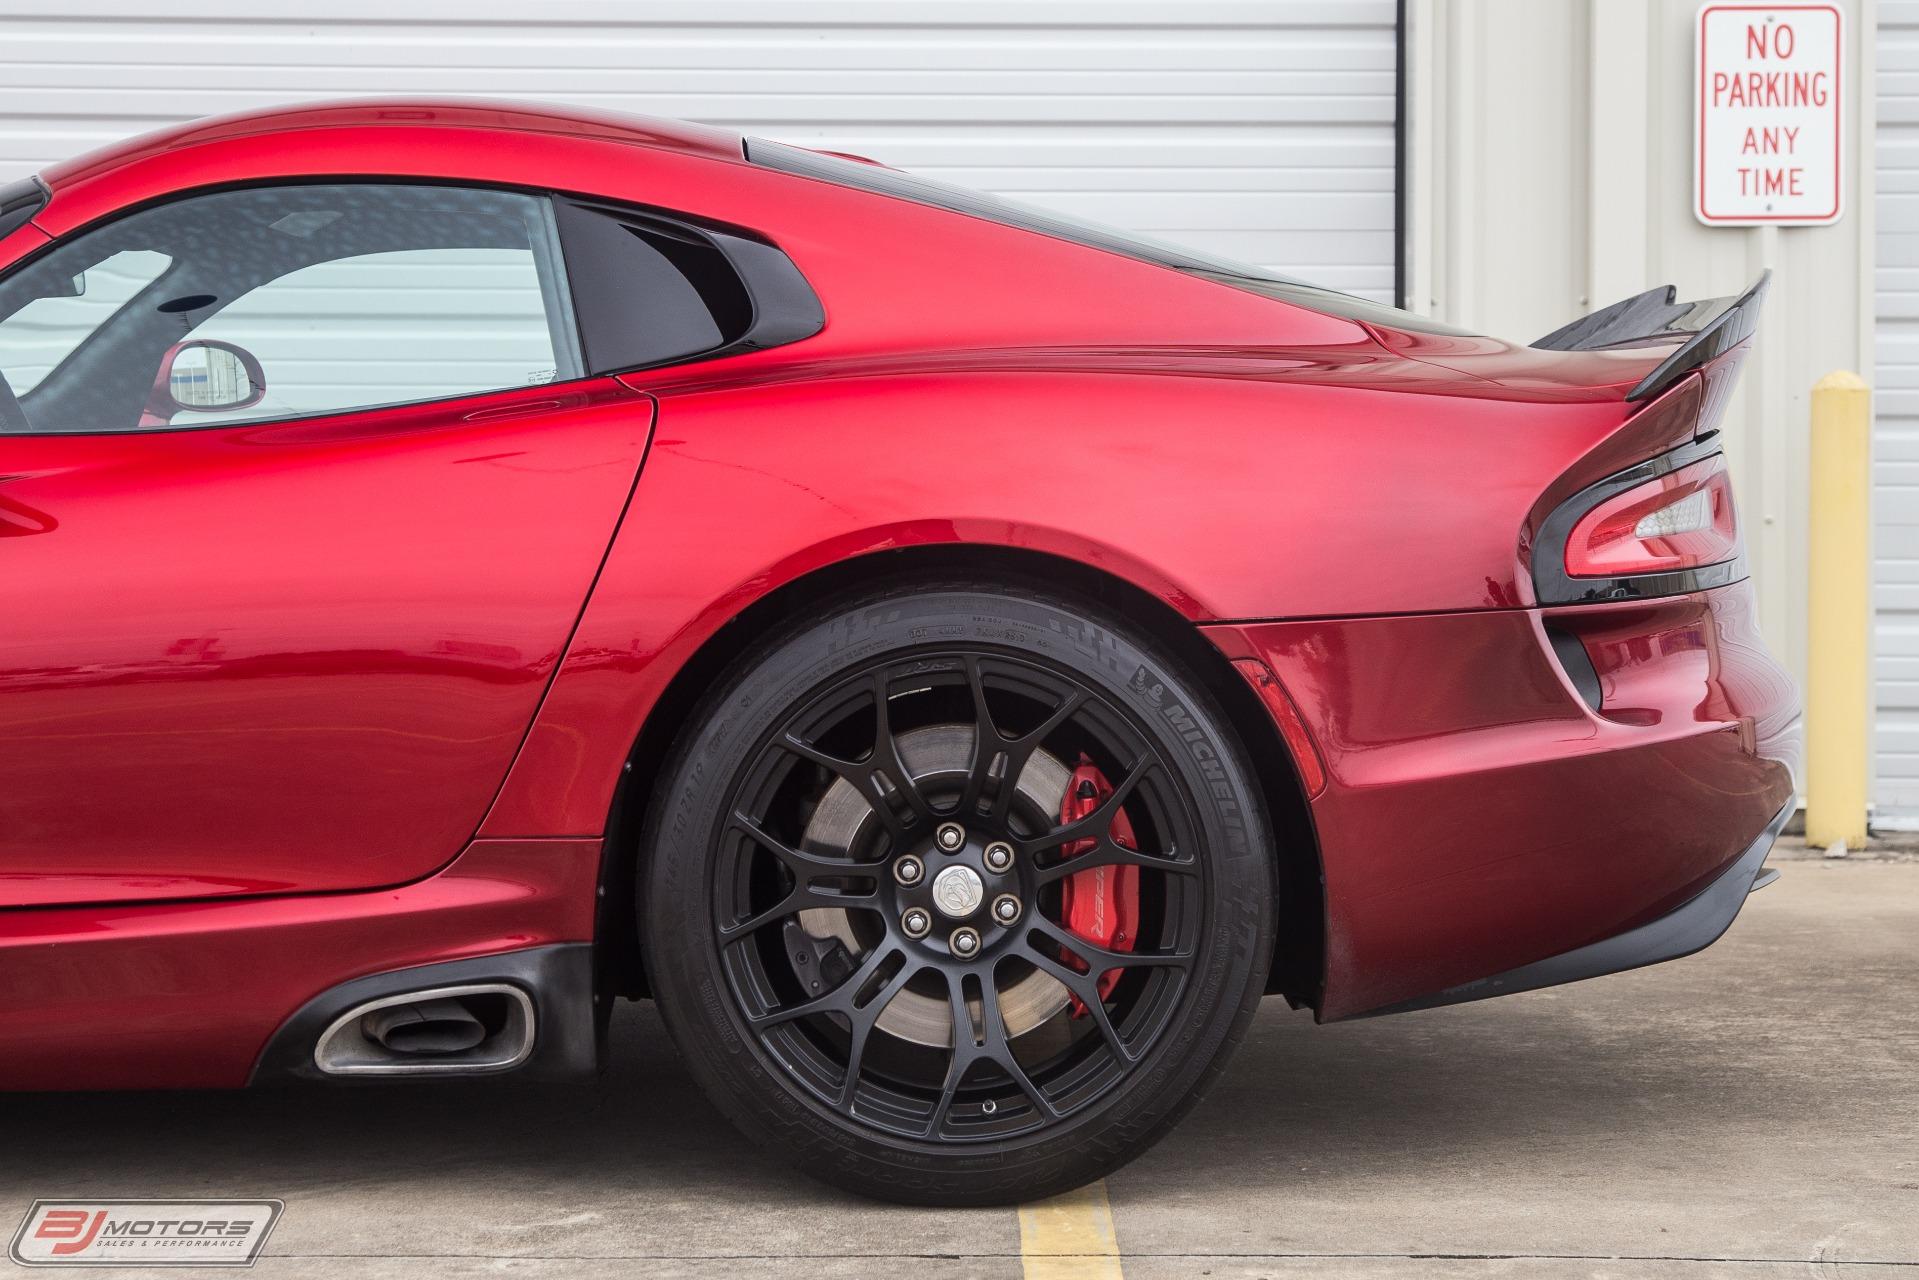 Used-2013-Dodge-SRT-Viper-GTS-Stryker-Red